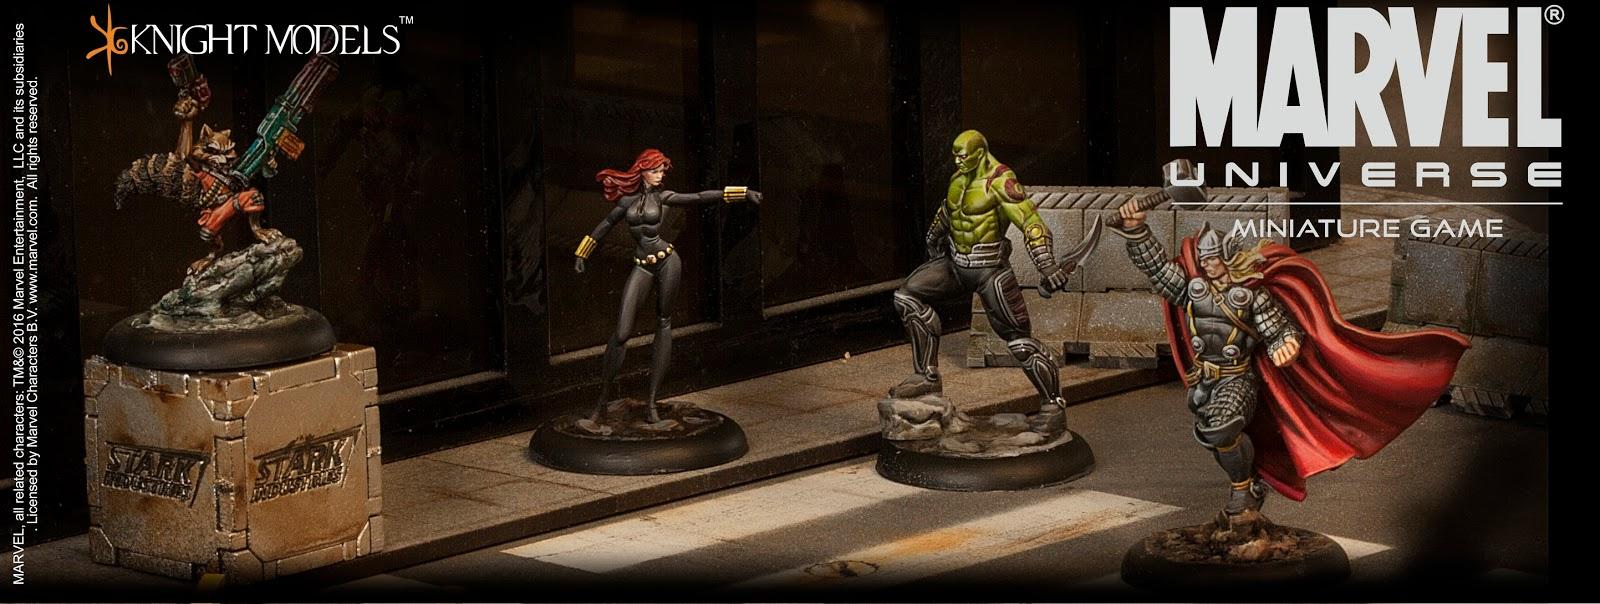 Marvel Universe Miniature Game CABECERAFACEBOOK2